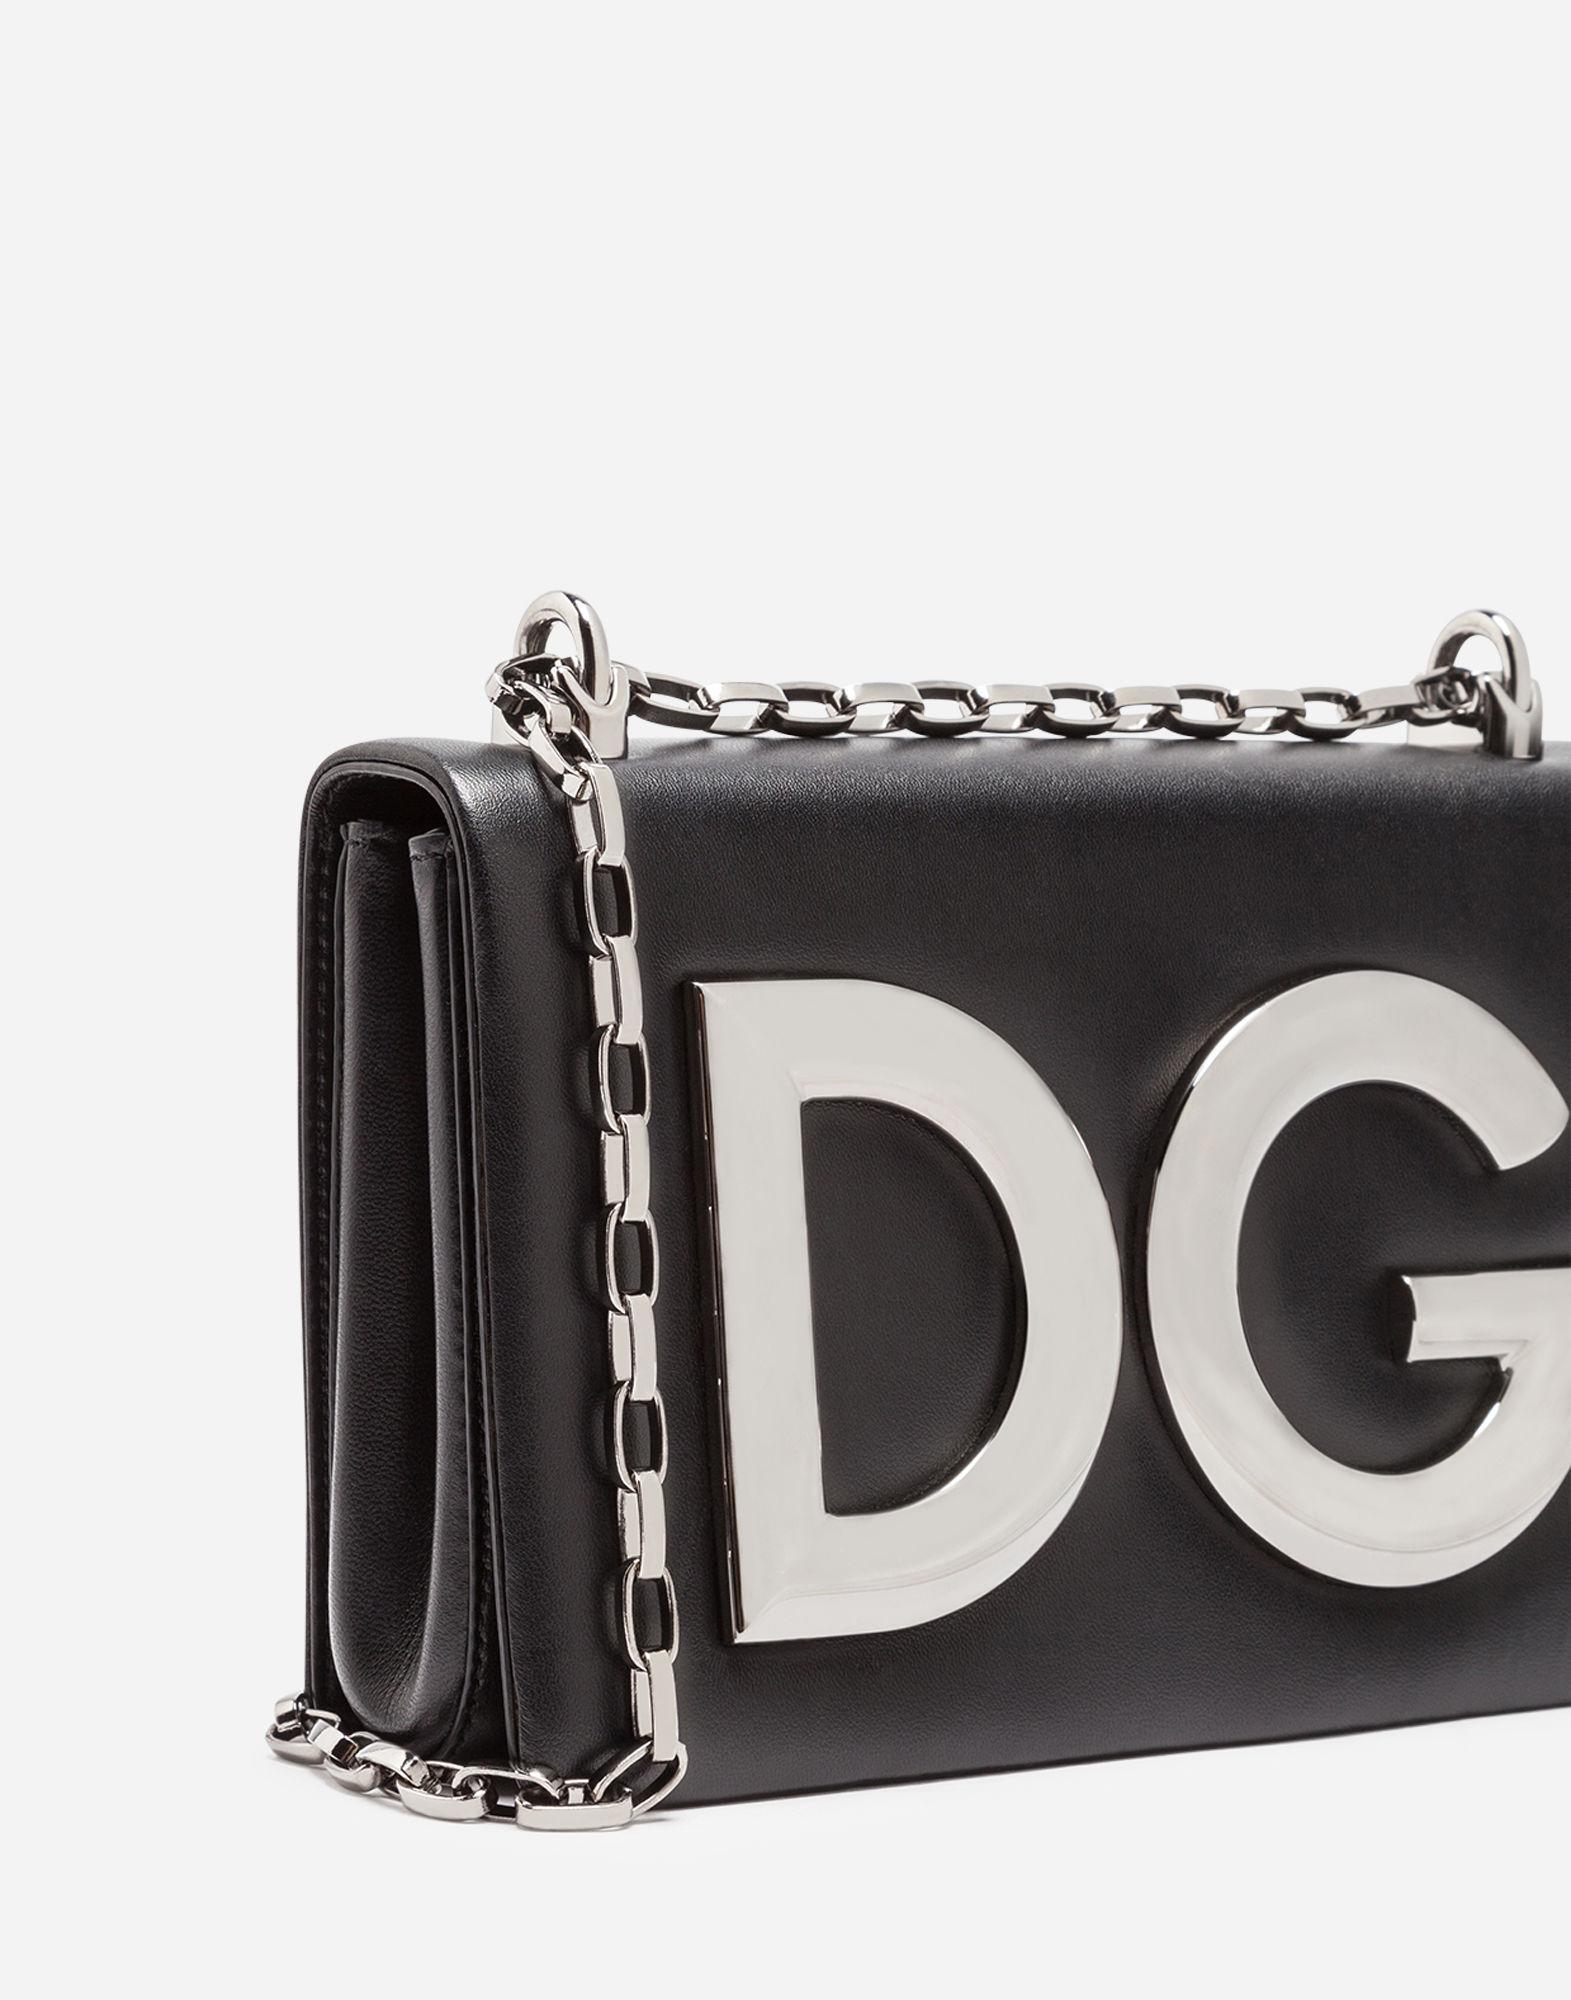 7ce7150f94 Lyst - Dolce   Gabbana Dg Girls Shoulder Bag In Nappa Leather in Black